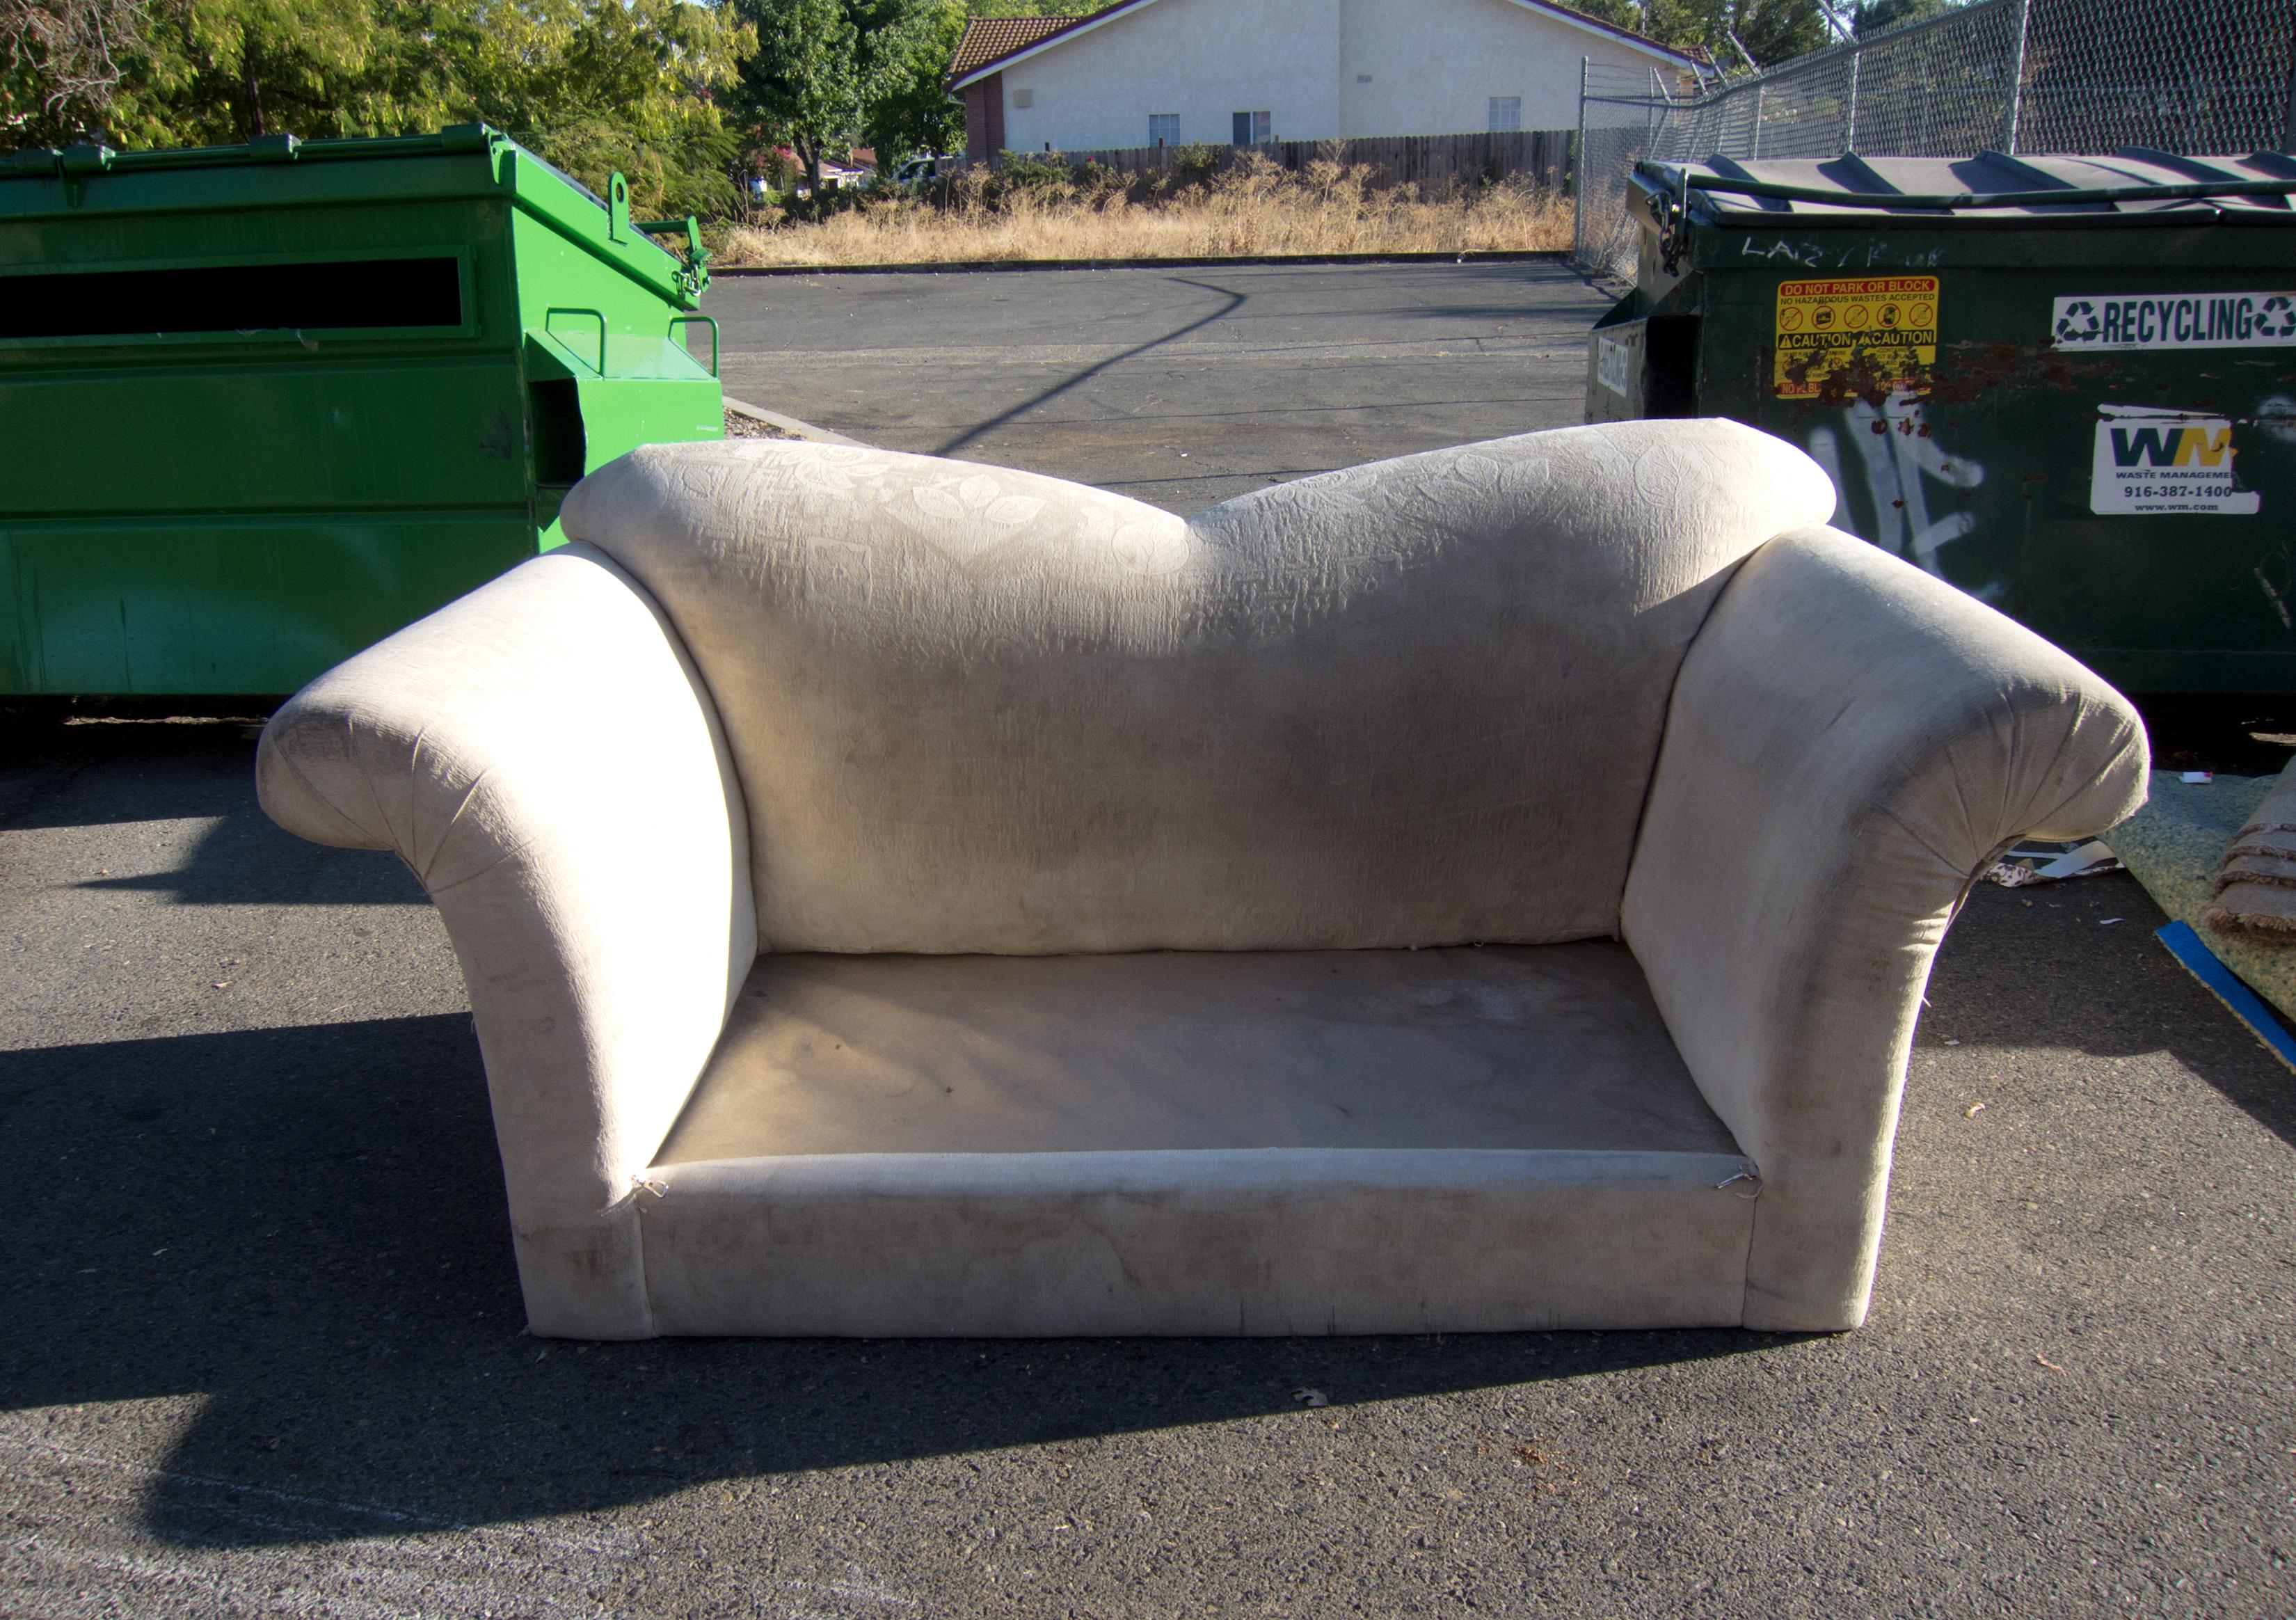 Wheel Asphalt Vehicle Furniture Sofa Bumper Free Trash Garbage Loveseat  Automotive Exterior